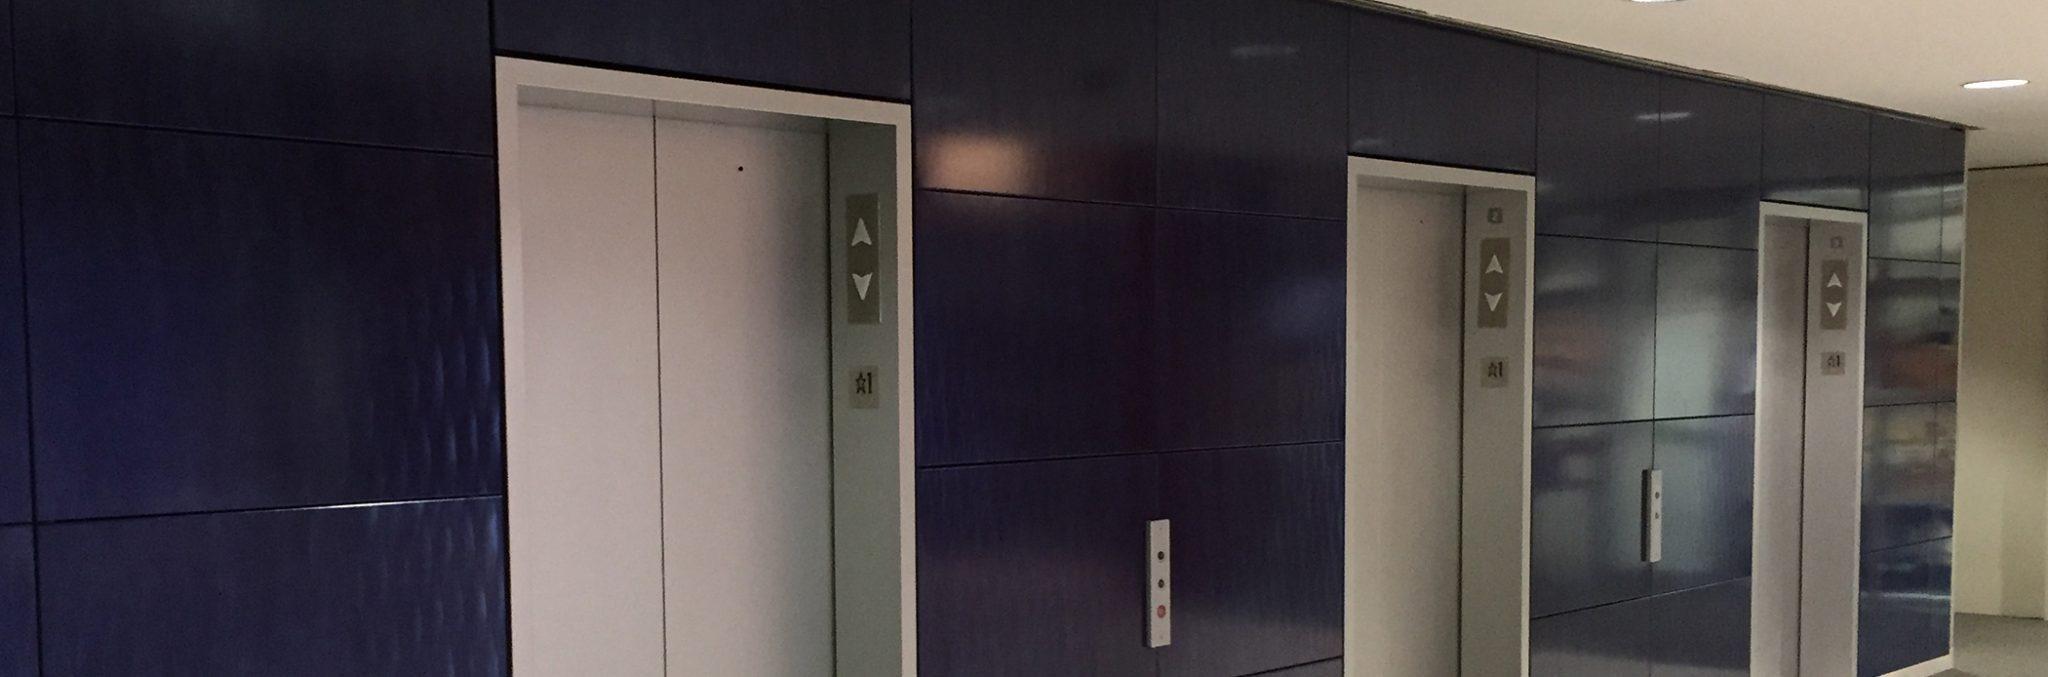 Aluminum metal, Stainless Steel, Flat Metal Wall, Keyway Walls, Terrace Walls, Moz designer metals